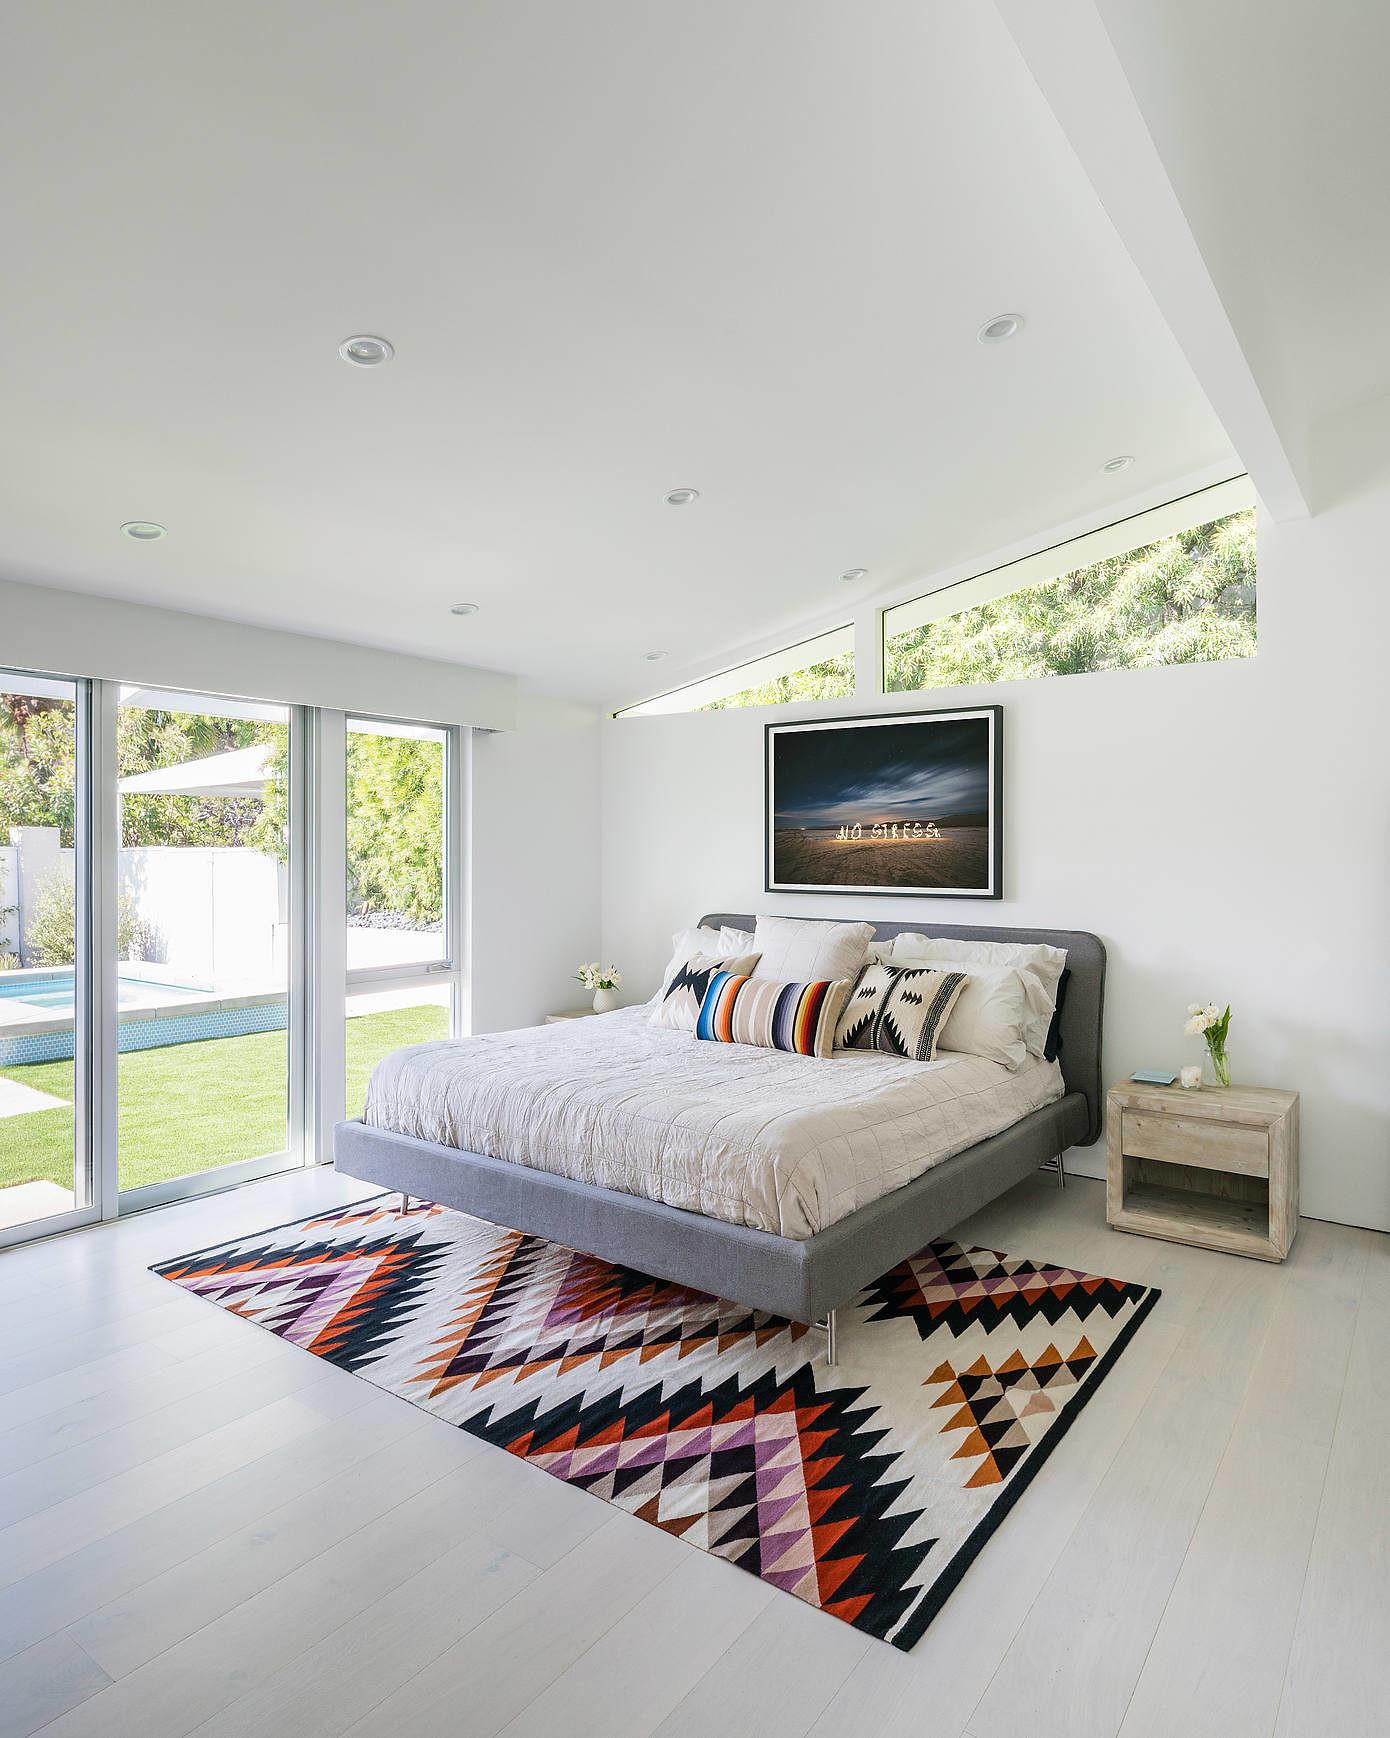 LA Midcentury Home by Alexander Gorlin Architects